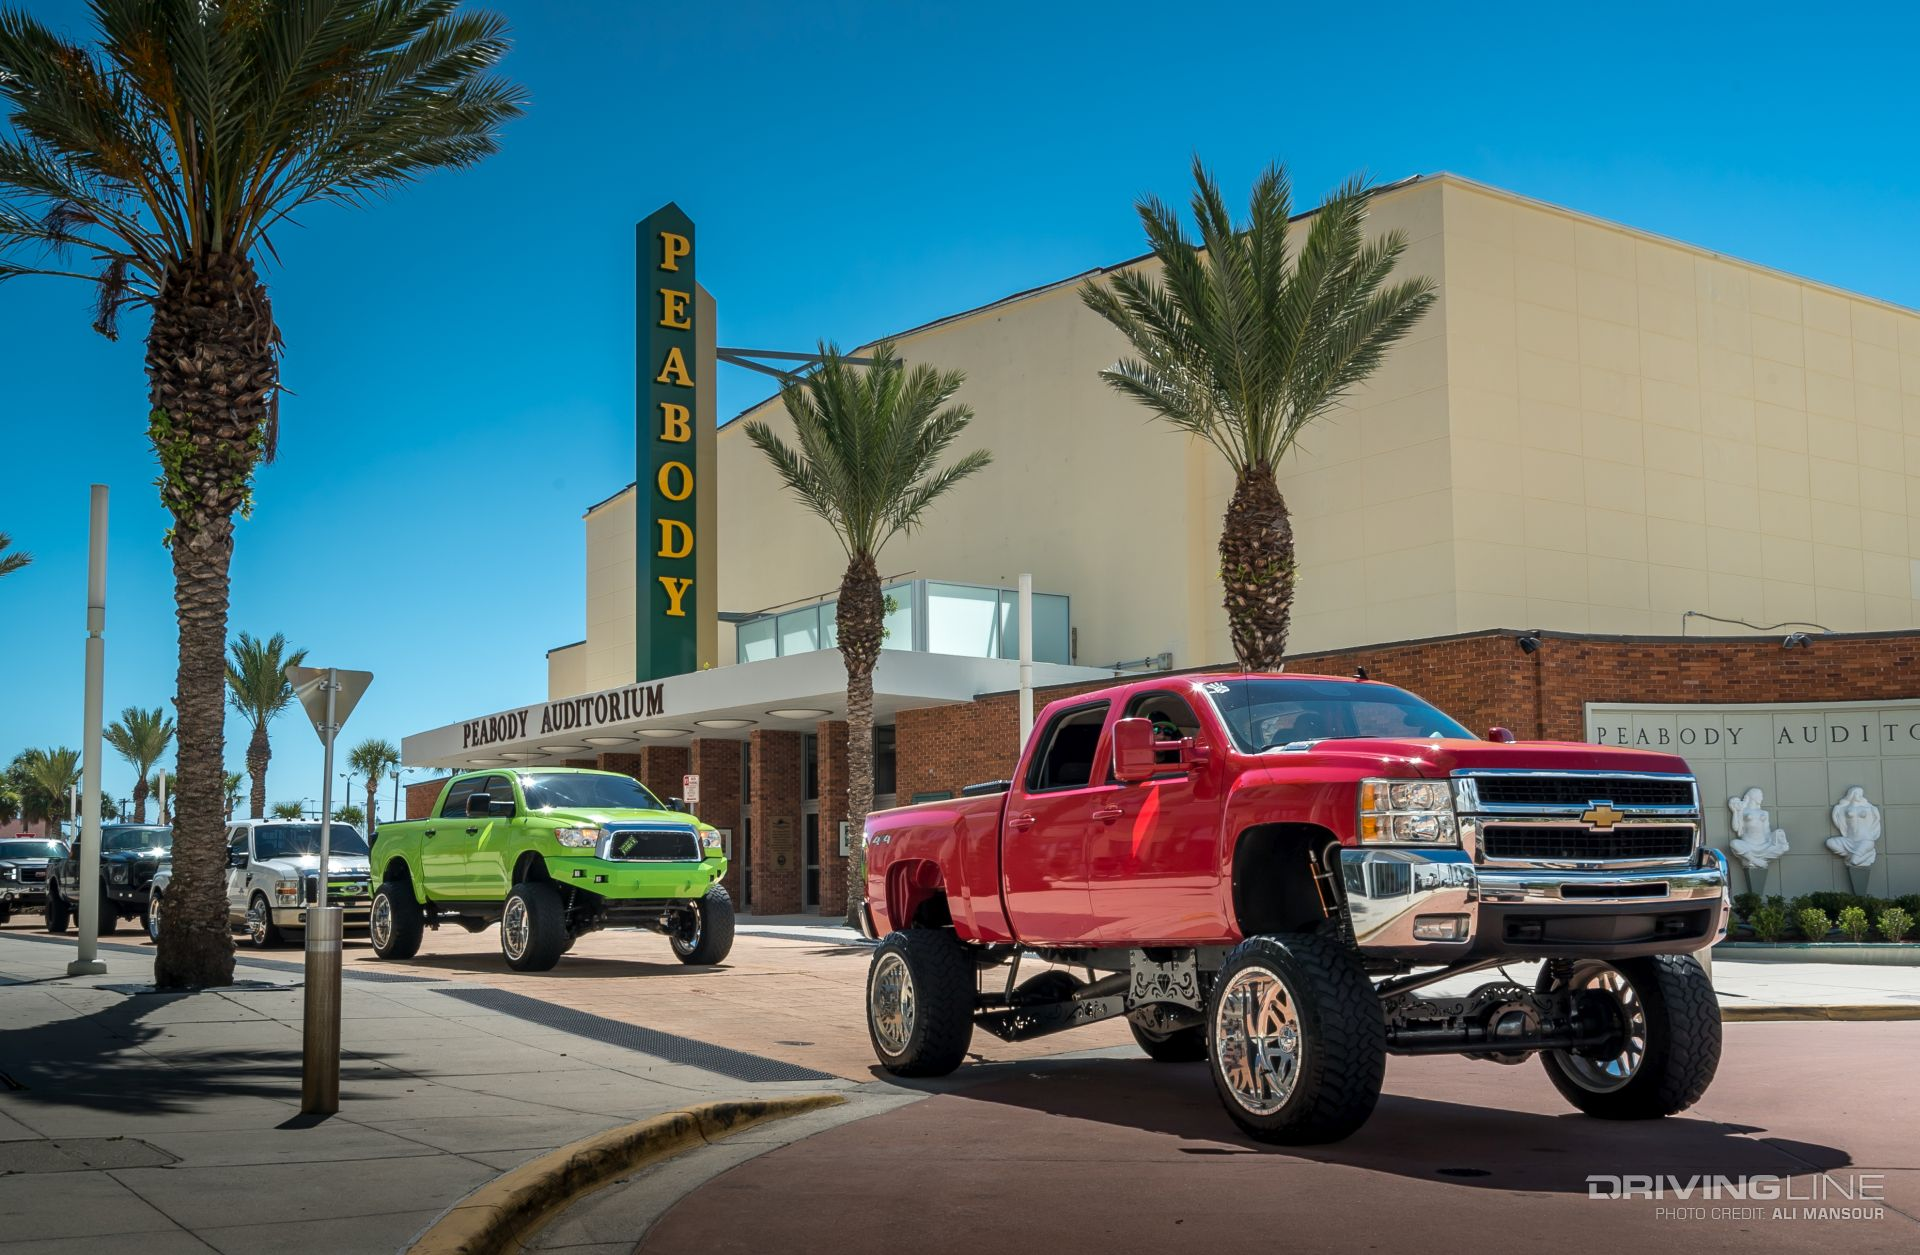 Battle Of The Bling The 2017 Daytona Truck Meet Drivingline